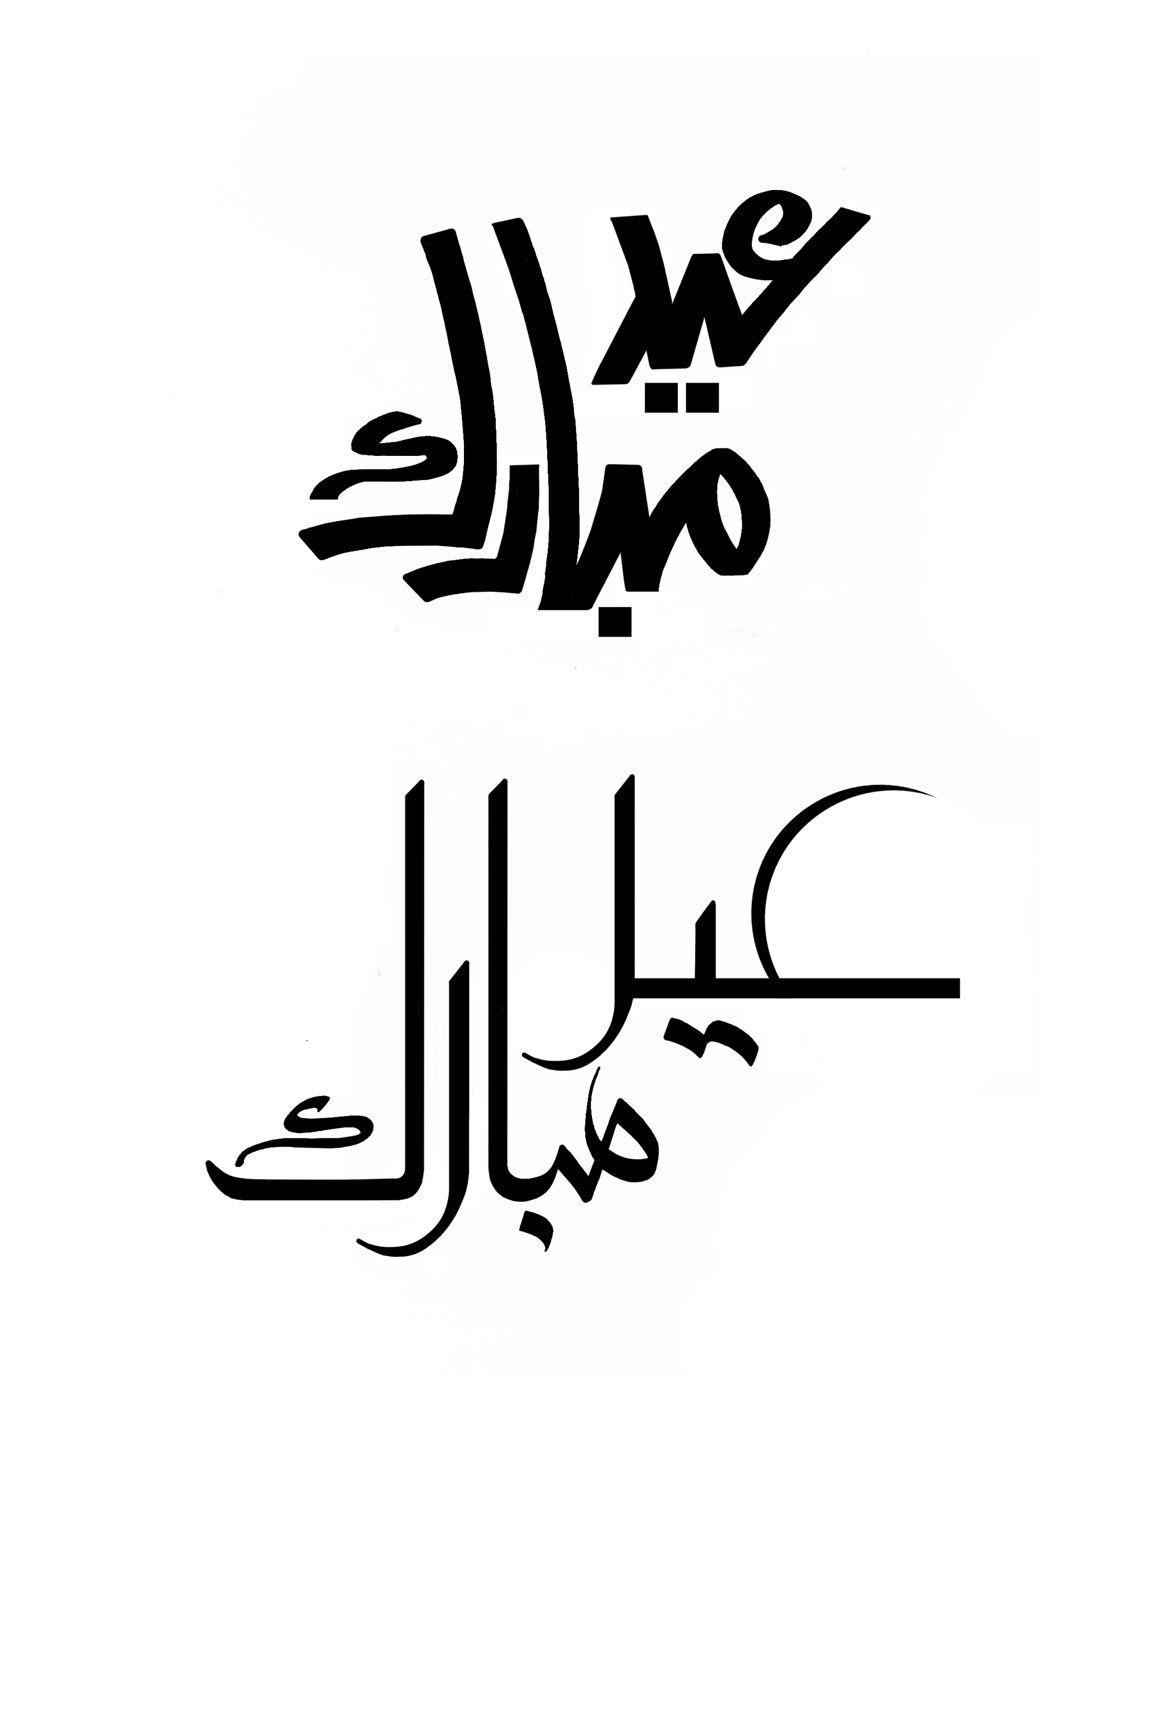 Javed Aslam S Calligraphy Eid Mubarak Calligraphy Typography Design Eid Mubark Ramadan Lantern Happy Eid